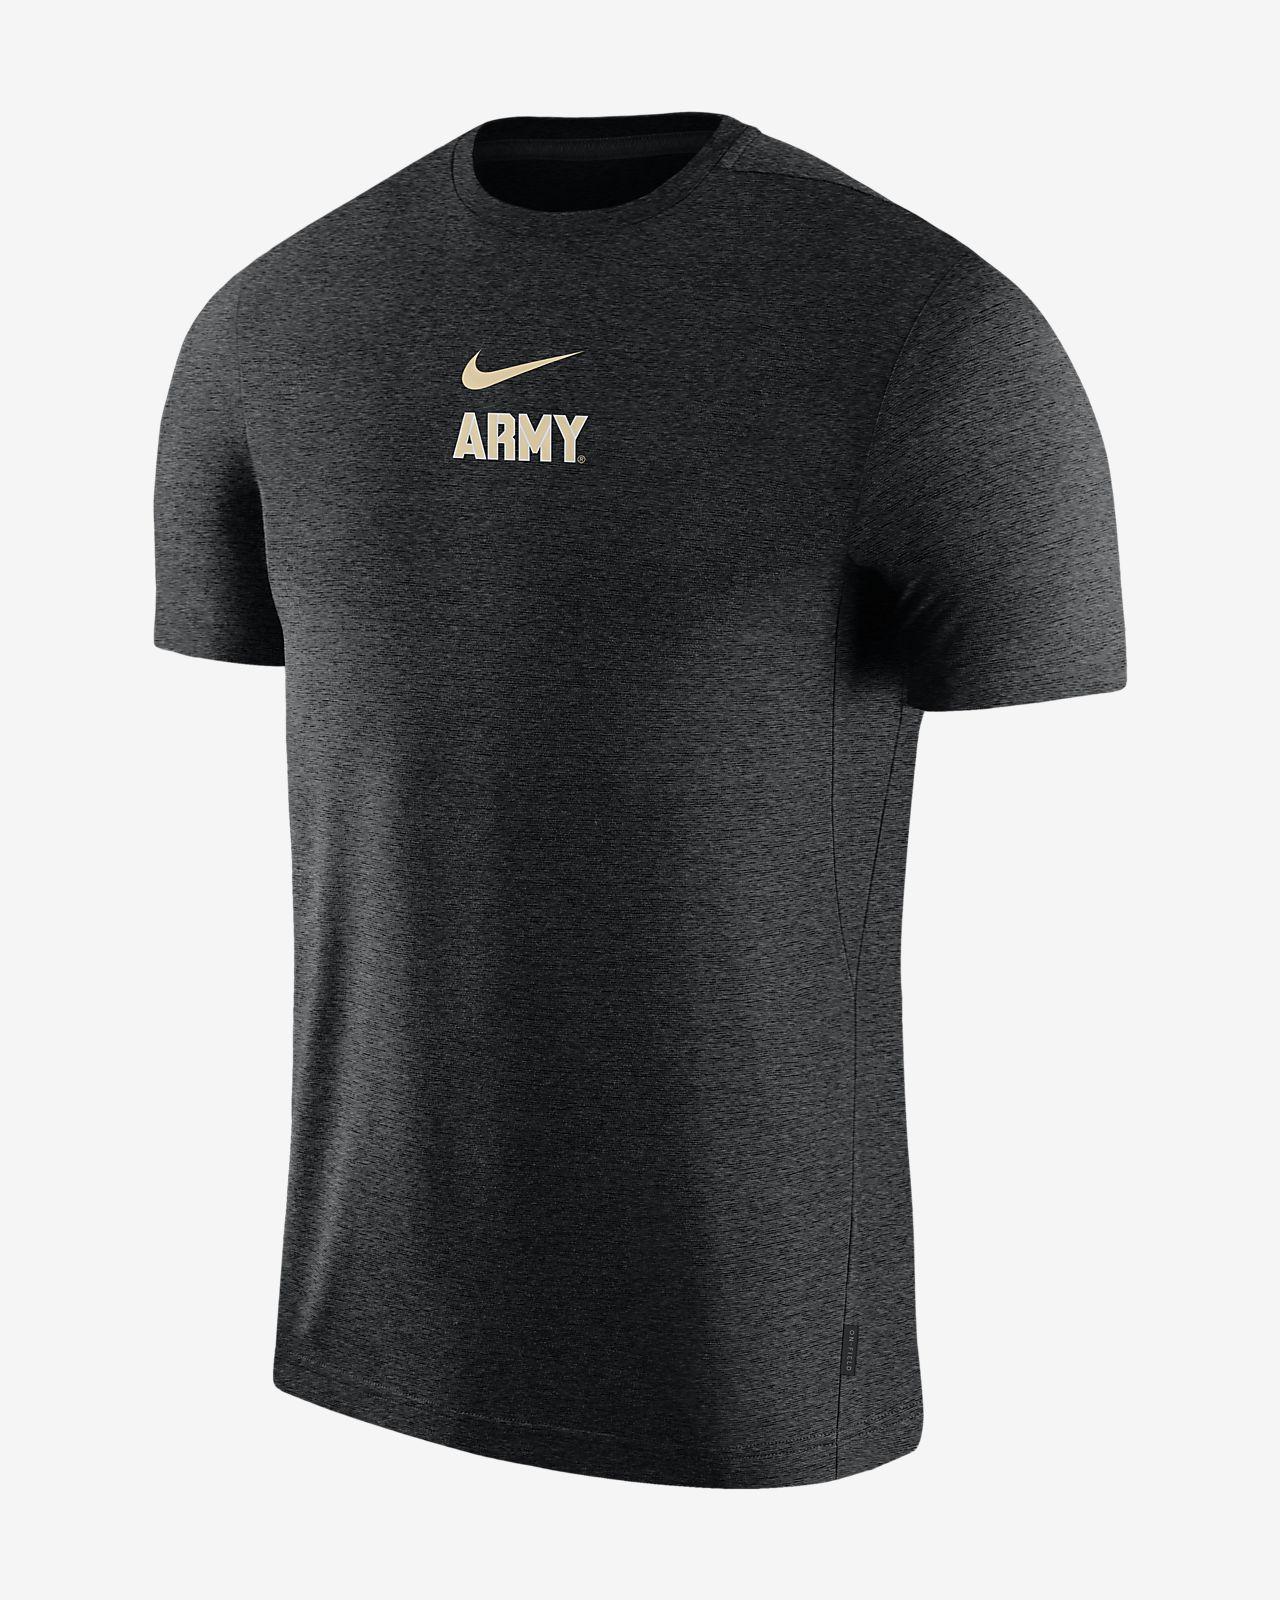 Nike College Dri-FIT Coach (Army) Men's Short-Sleeve Top